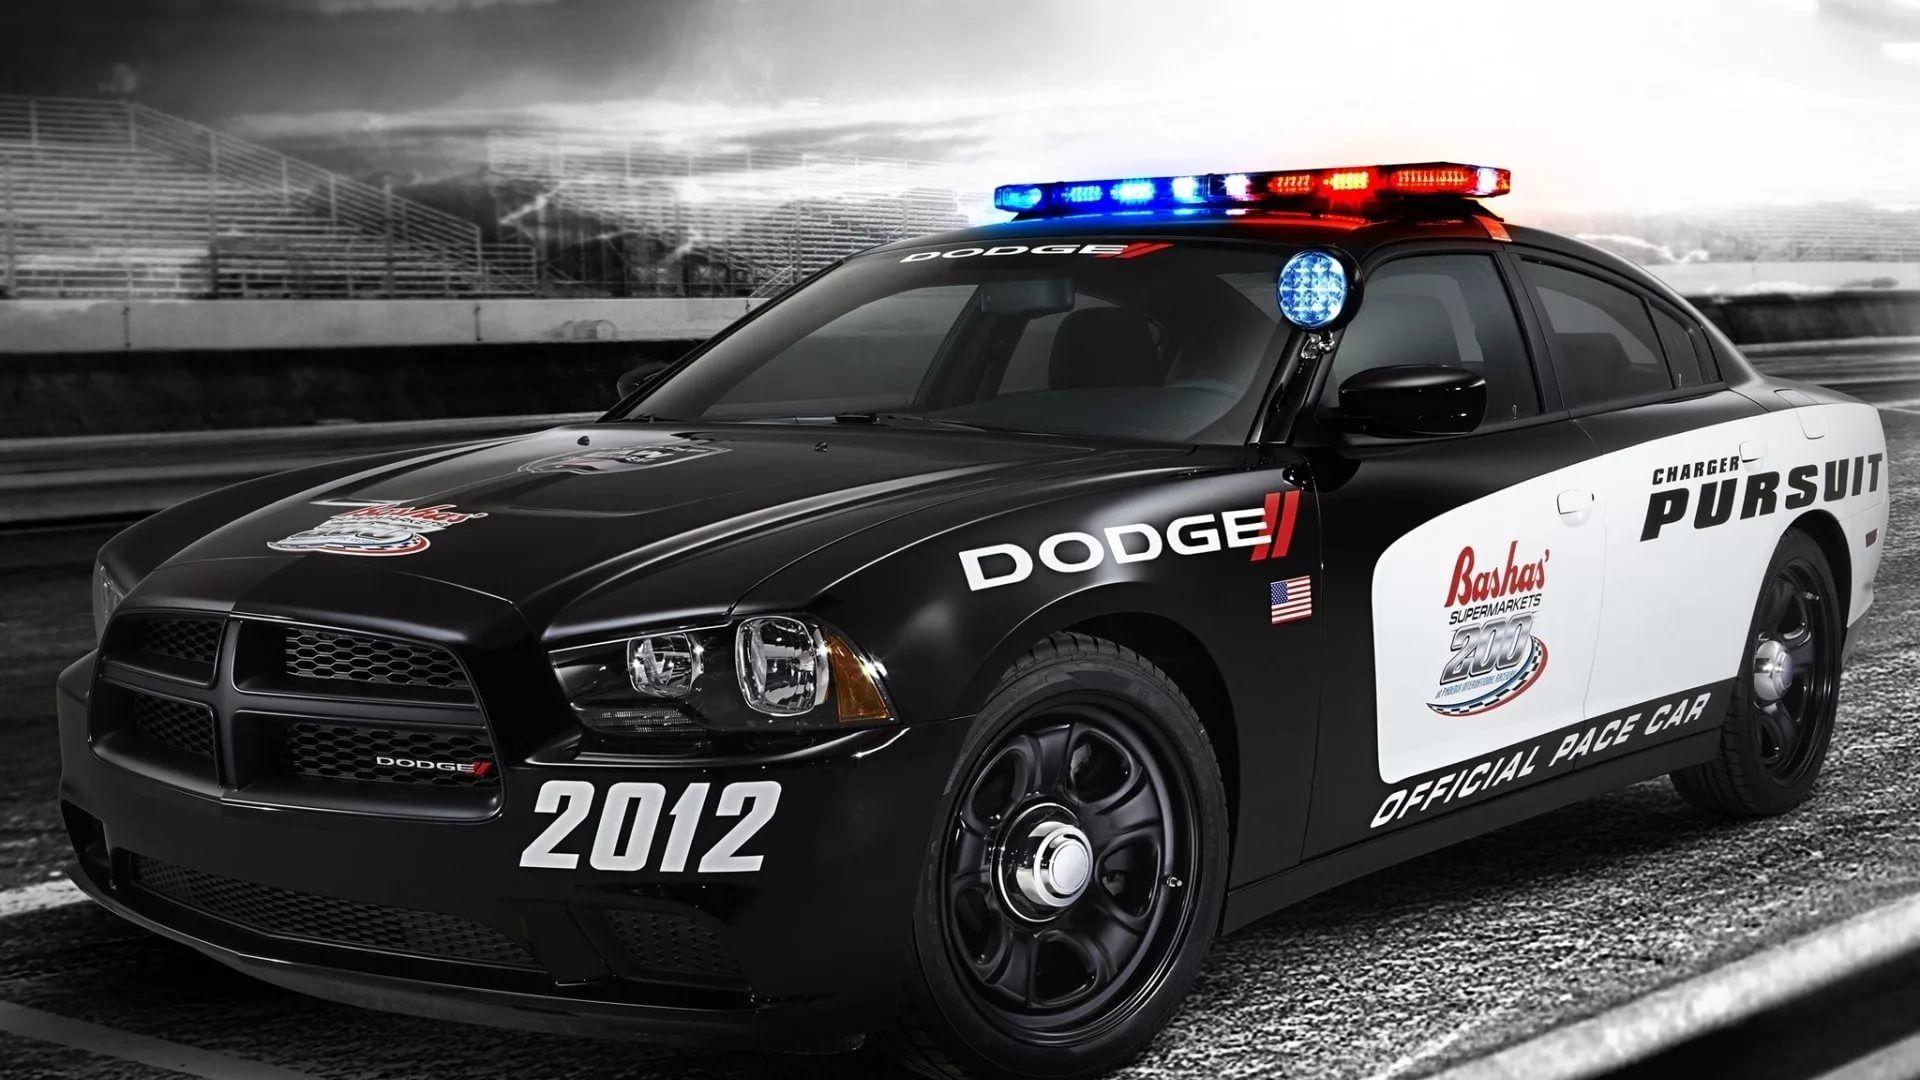 Police HD 1080 wallpaper